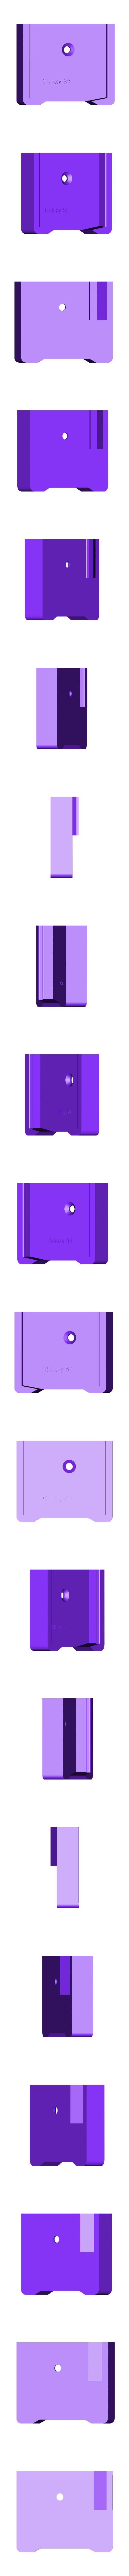 308 holder Support smartphone galaxy s9.STL Download STL file Peugeot 308 smartphone support • 3D printer design, C1-concept